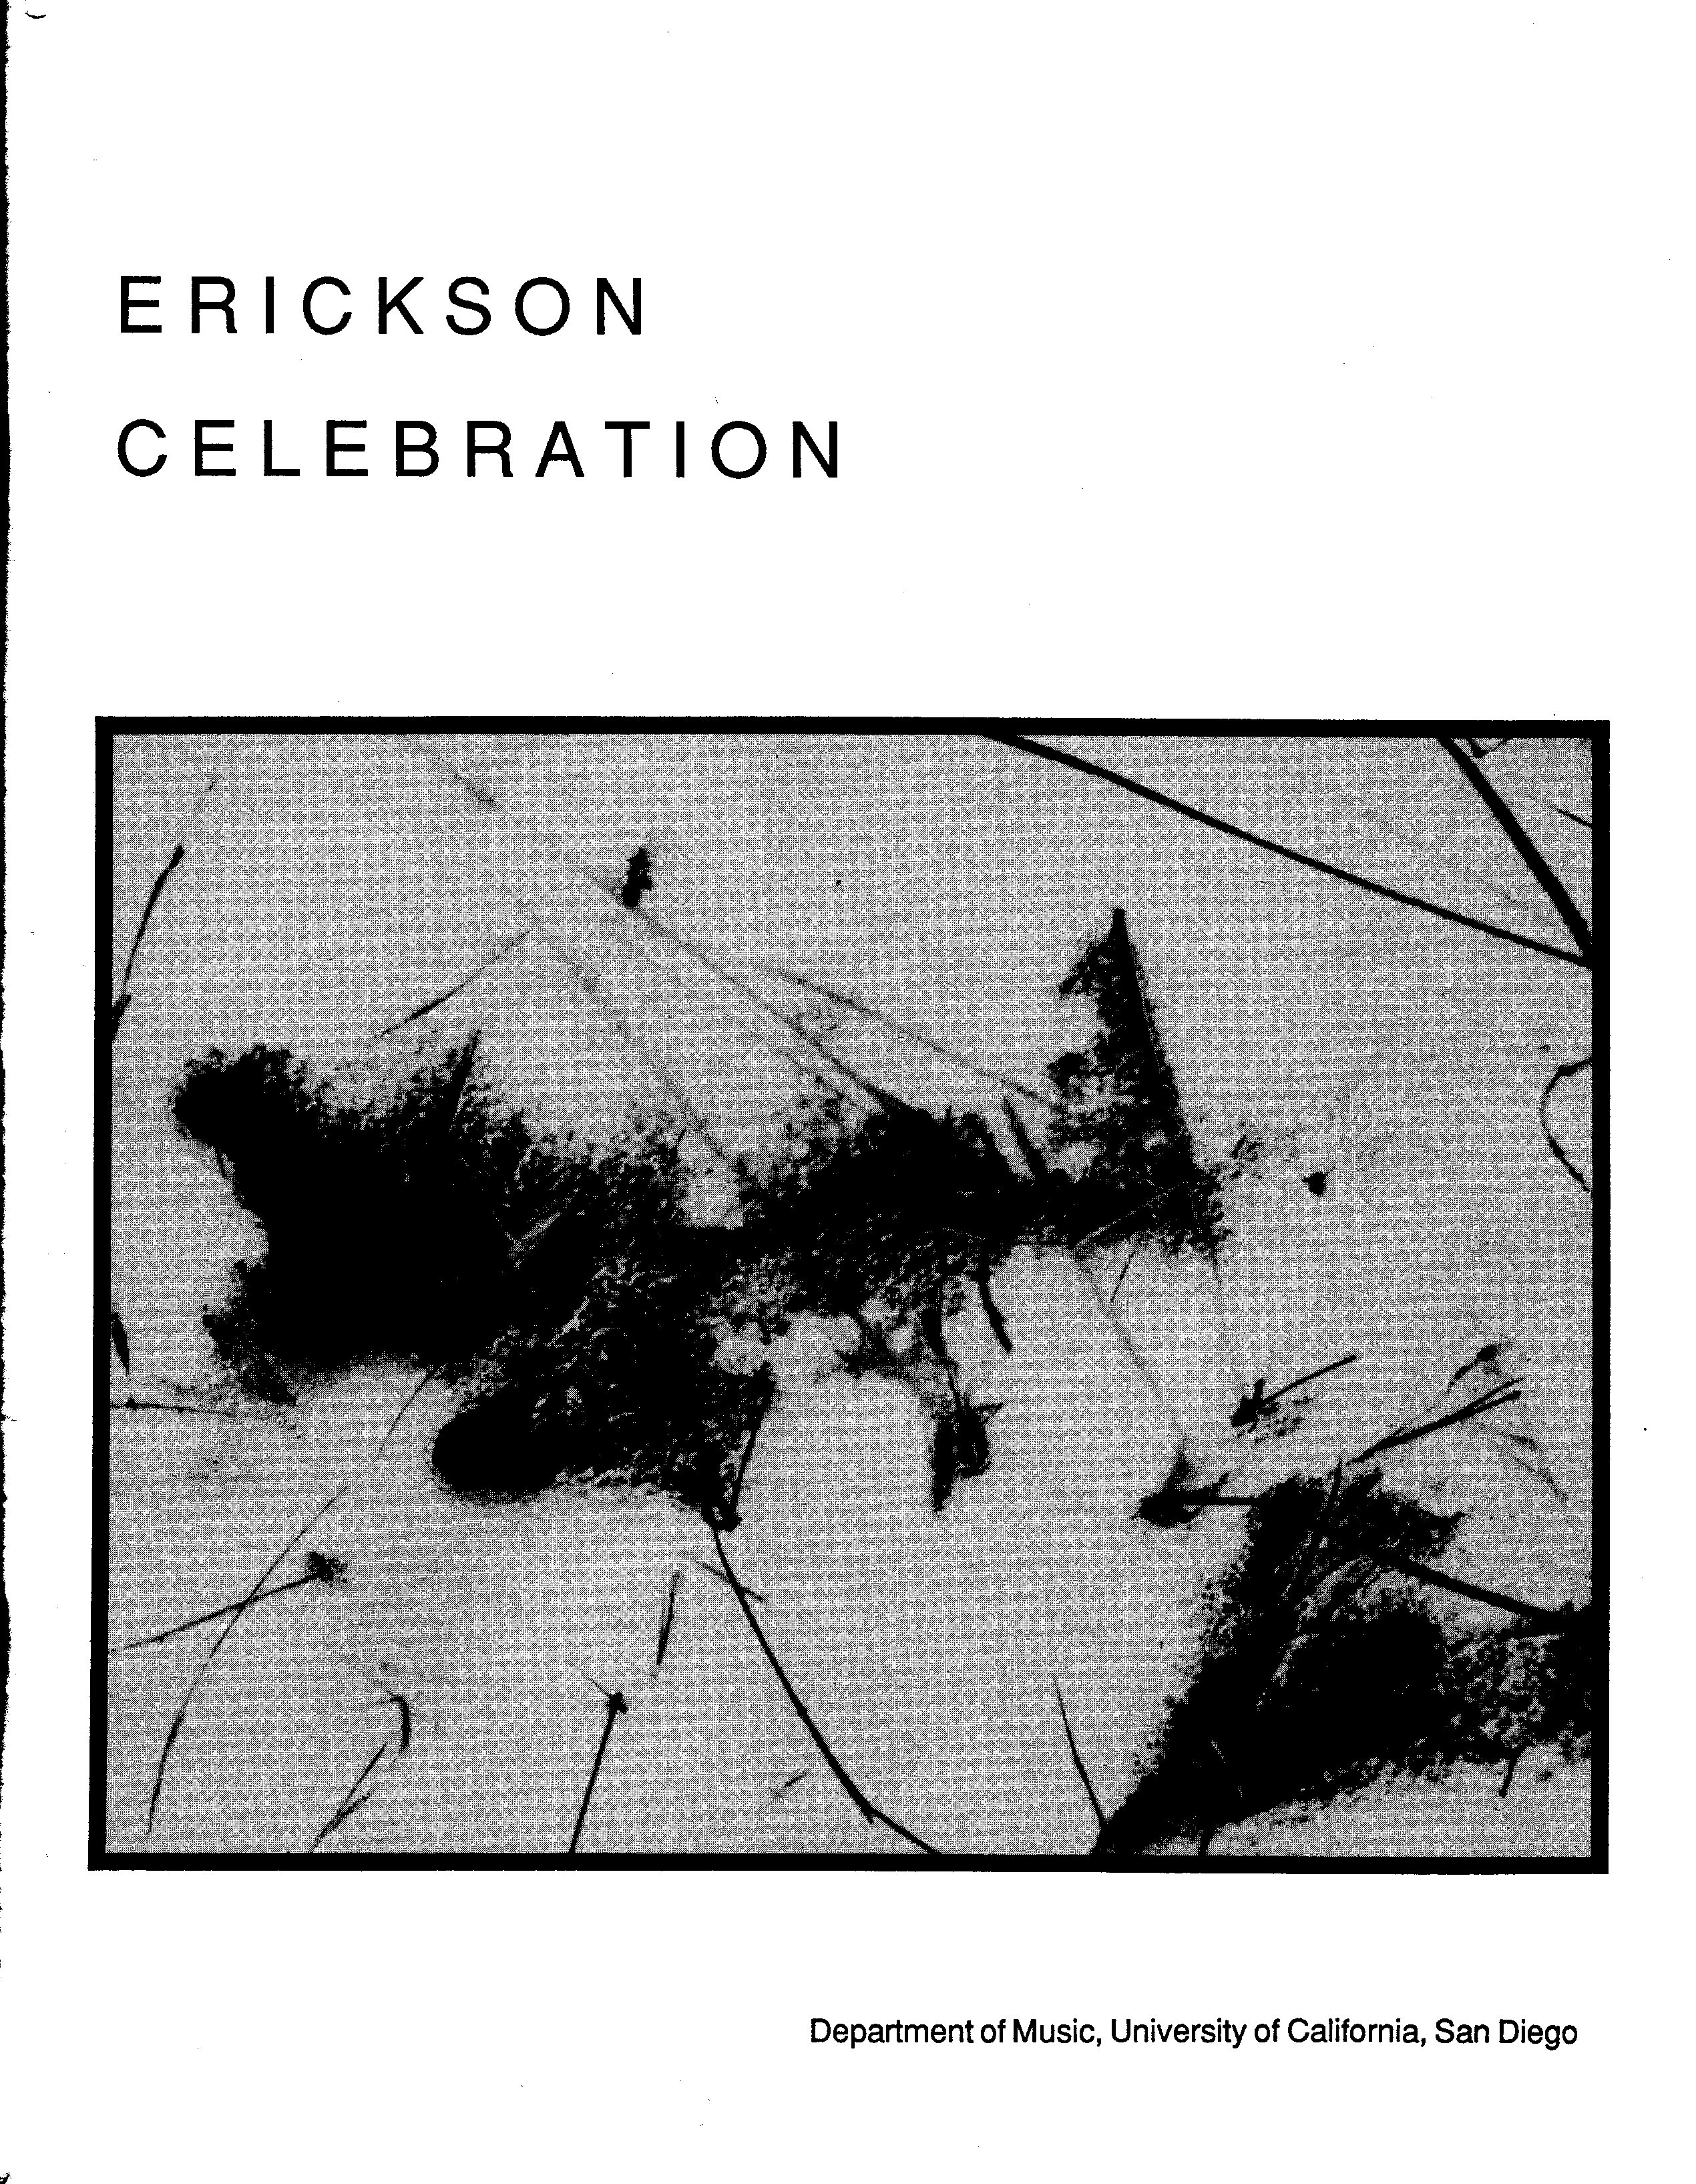 1987 Erickson Celebration